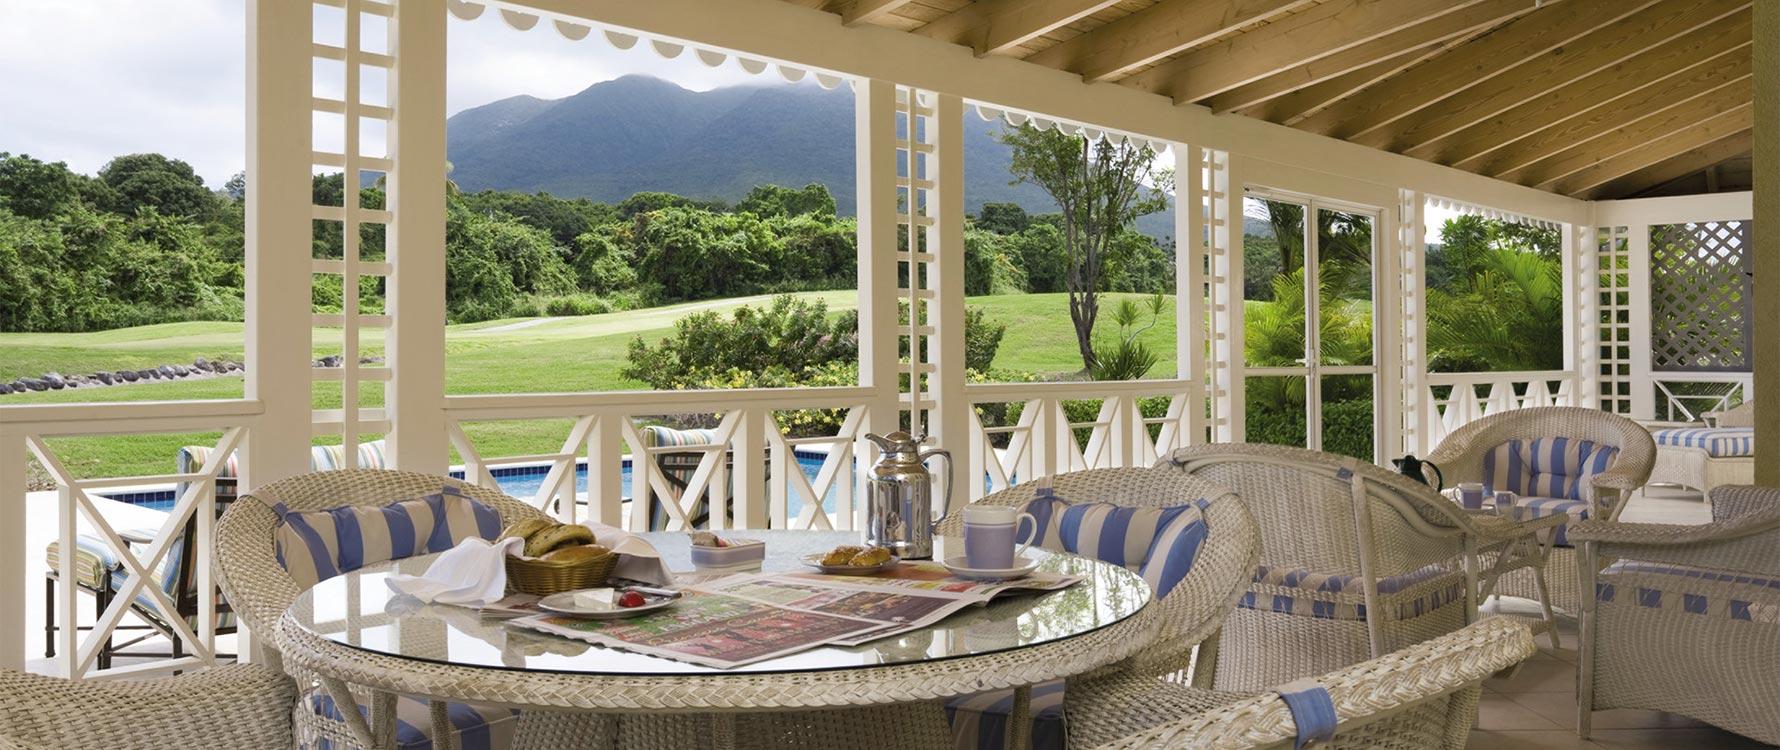 Screened veranda/lounge area